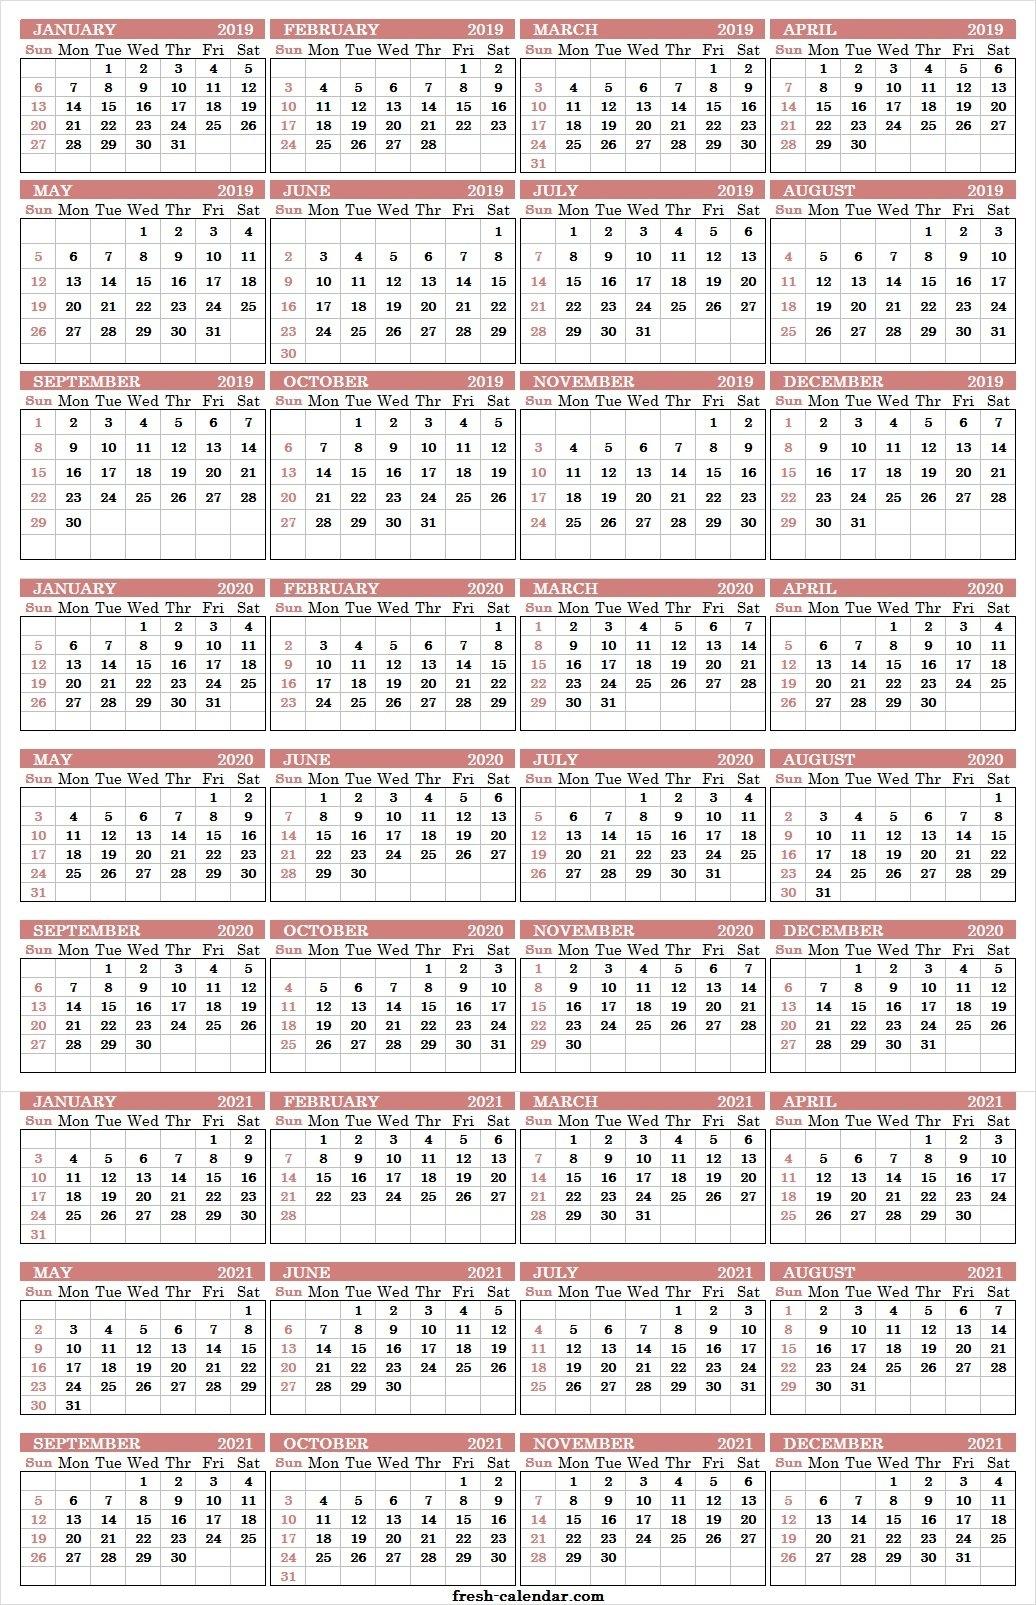 Three Yearly Calendar 2019 2020 2021 Printable Free | Blank Template 3 Year Calendar 2019 To 2021